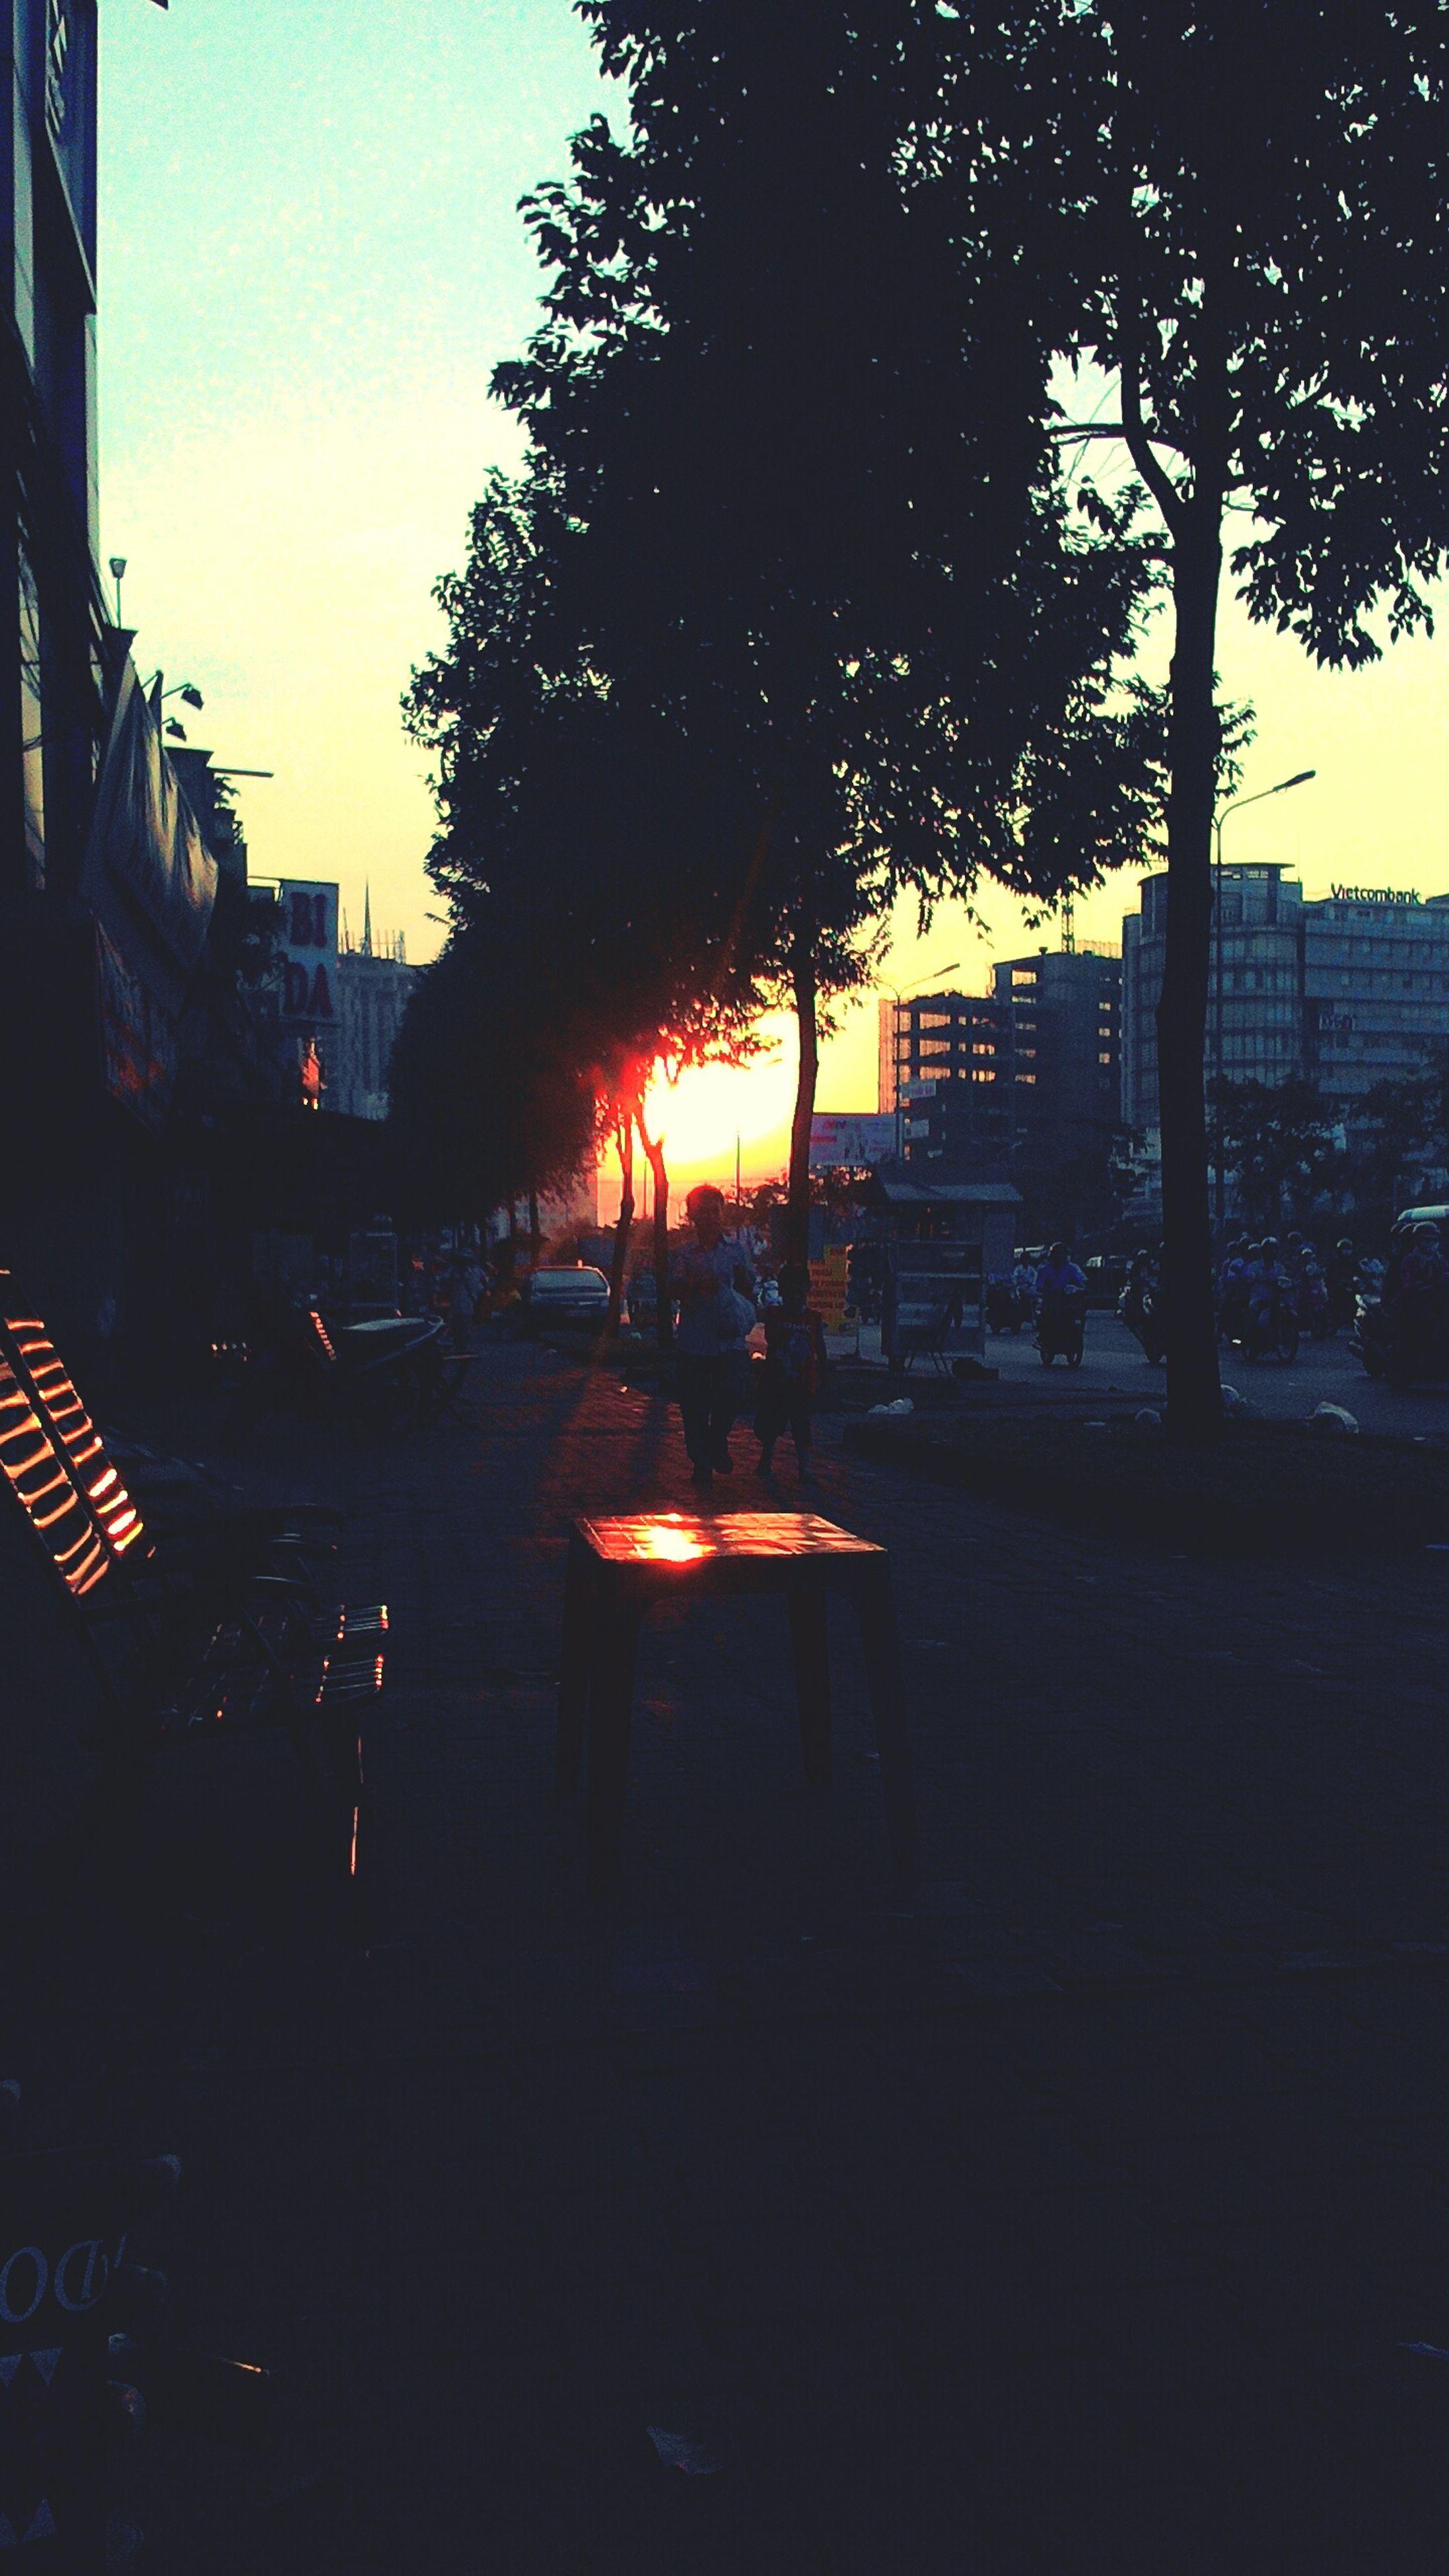 sunset, building exterior, city, architecture, built structure, car, transportation, street, land vehicle, silhouette, street light, mode of transport, tree, sky, road, city life, city street, sunlight, orange color, sun